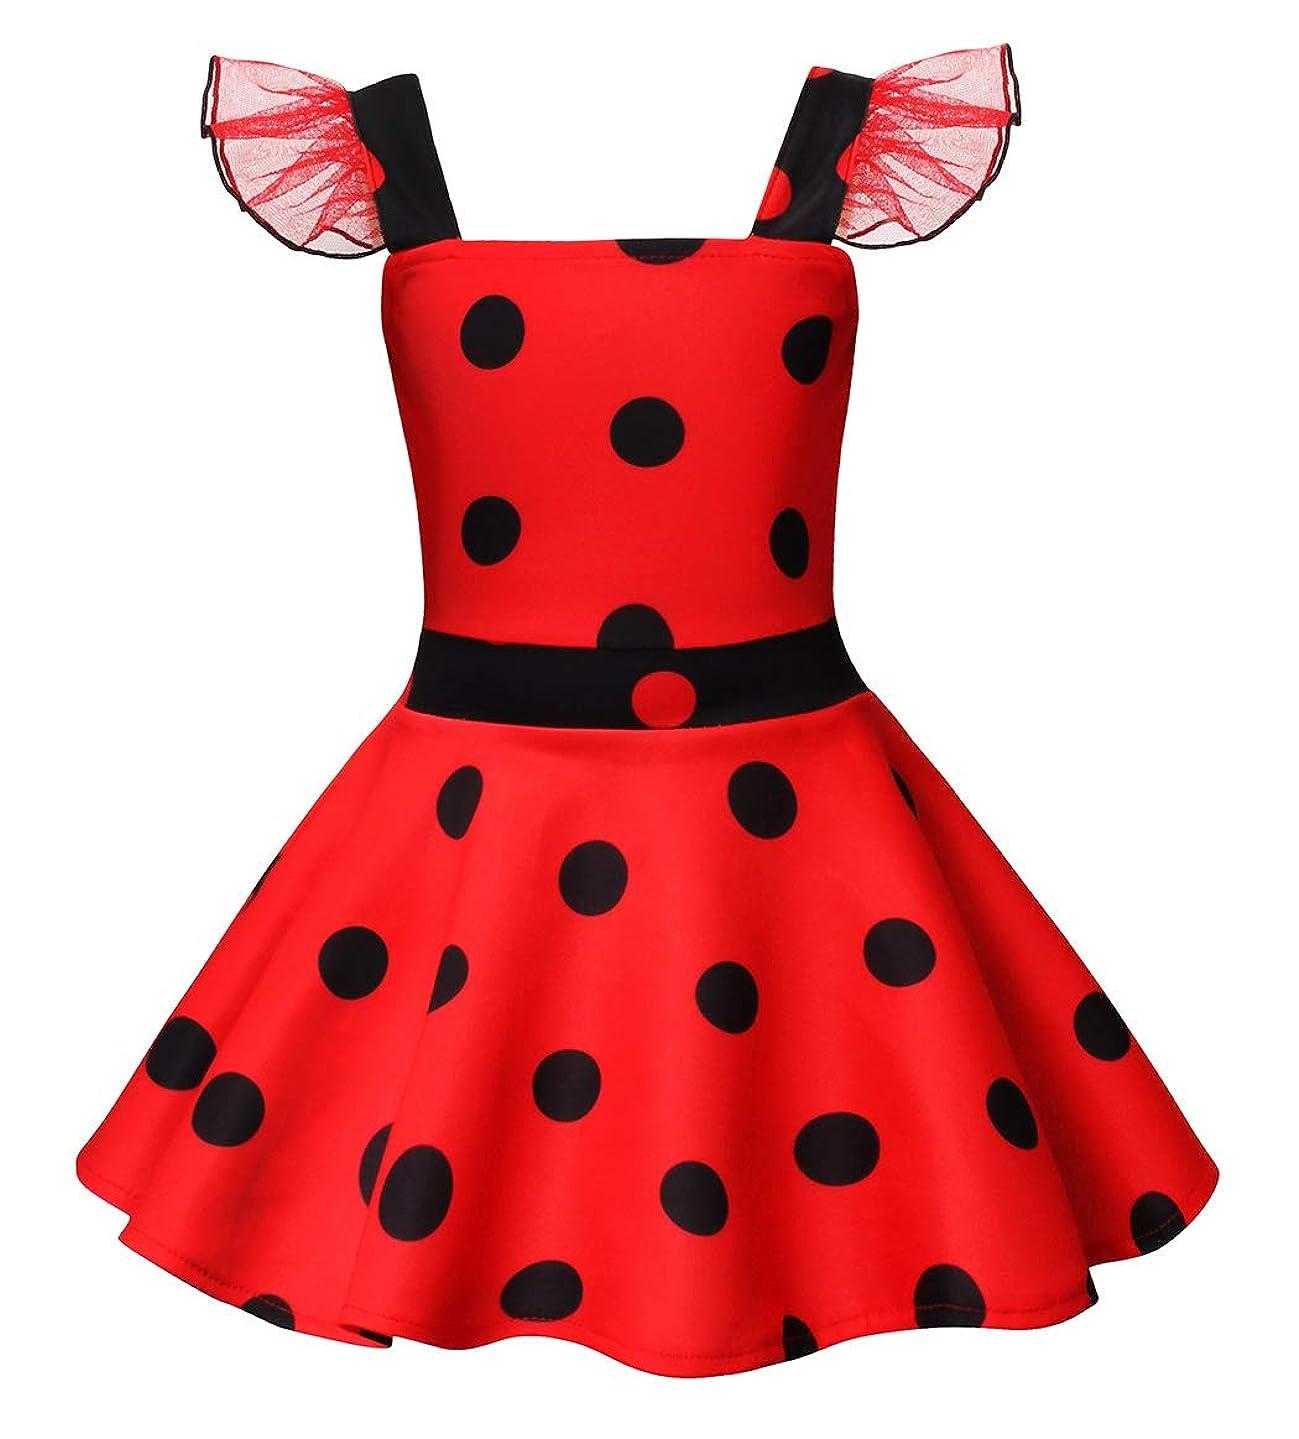 HenzWorld Ladybug Costume Dress Girls Princess Birthday Party Polka Dots Cosplay Outfit